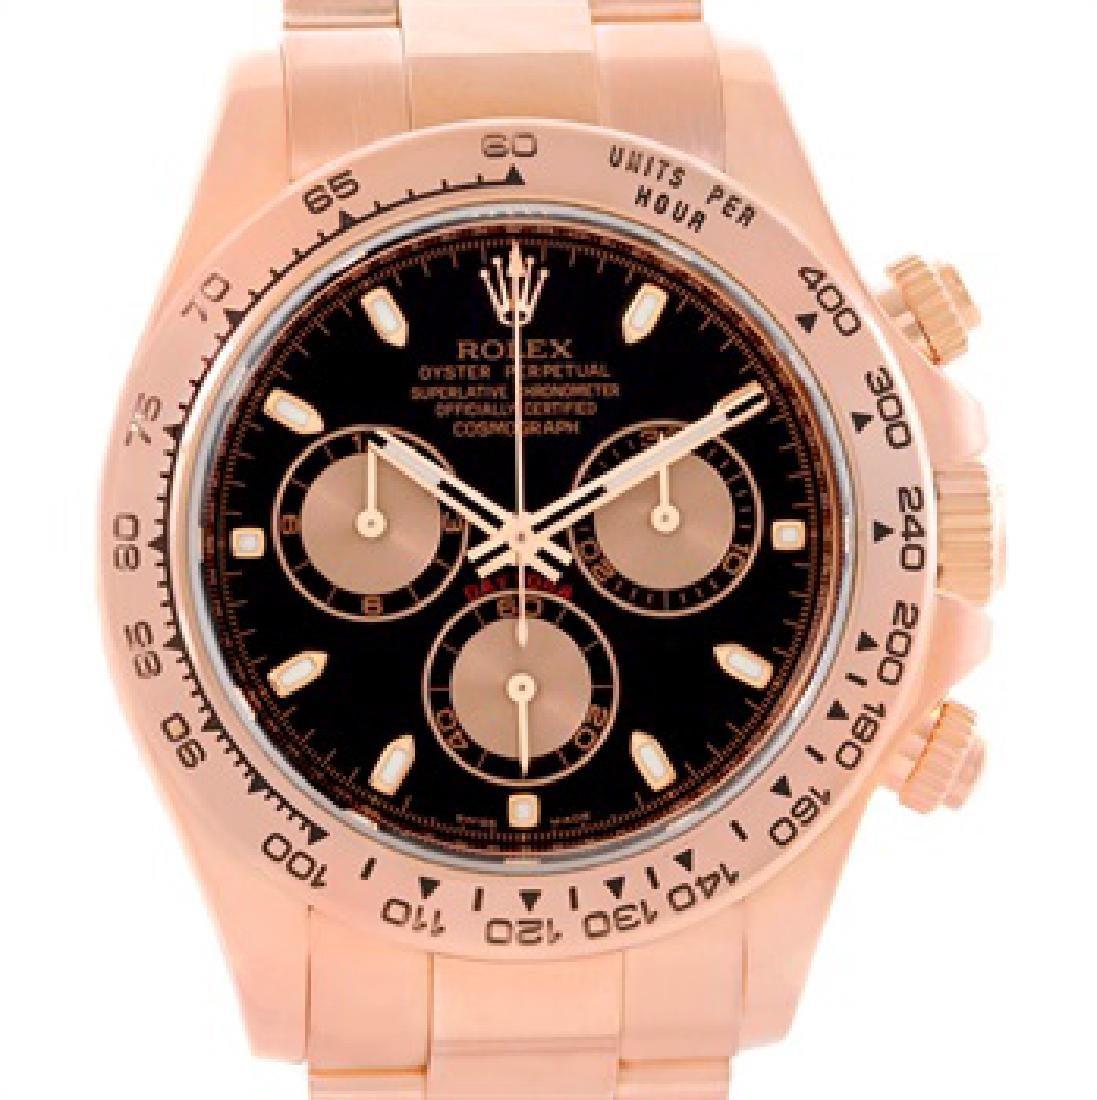 Rolex Cosmograph Daytona 18K Rose Gold Chronograph